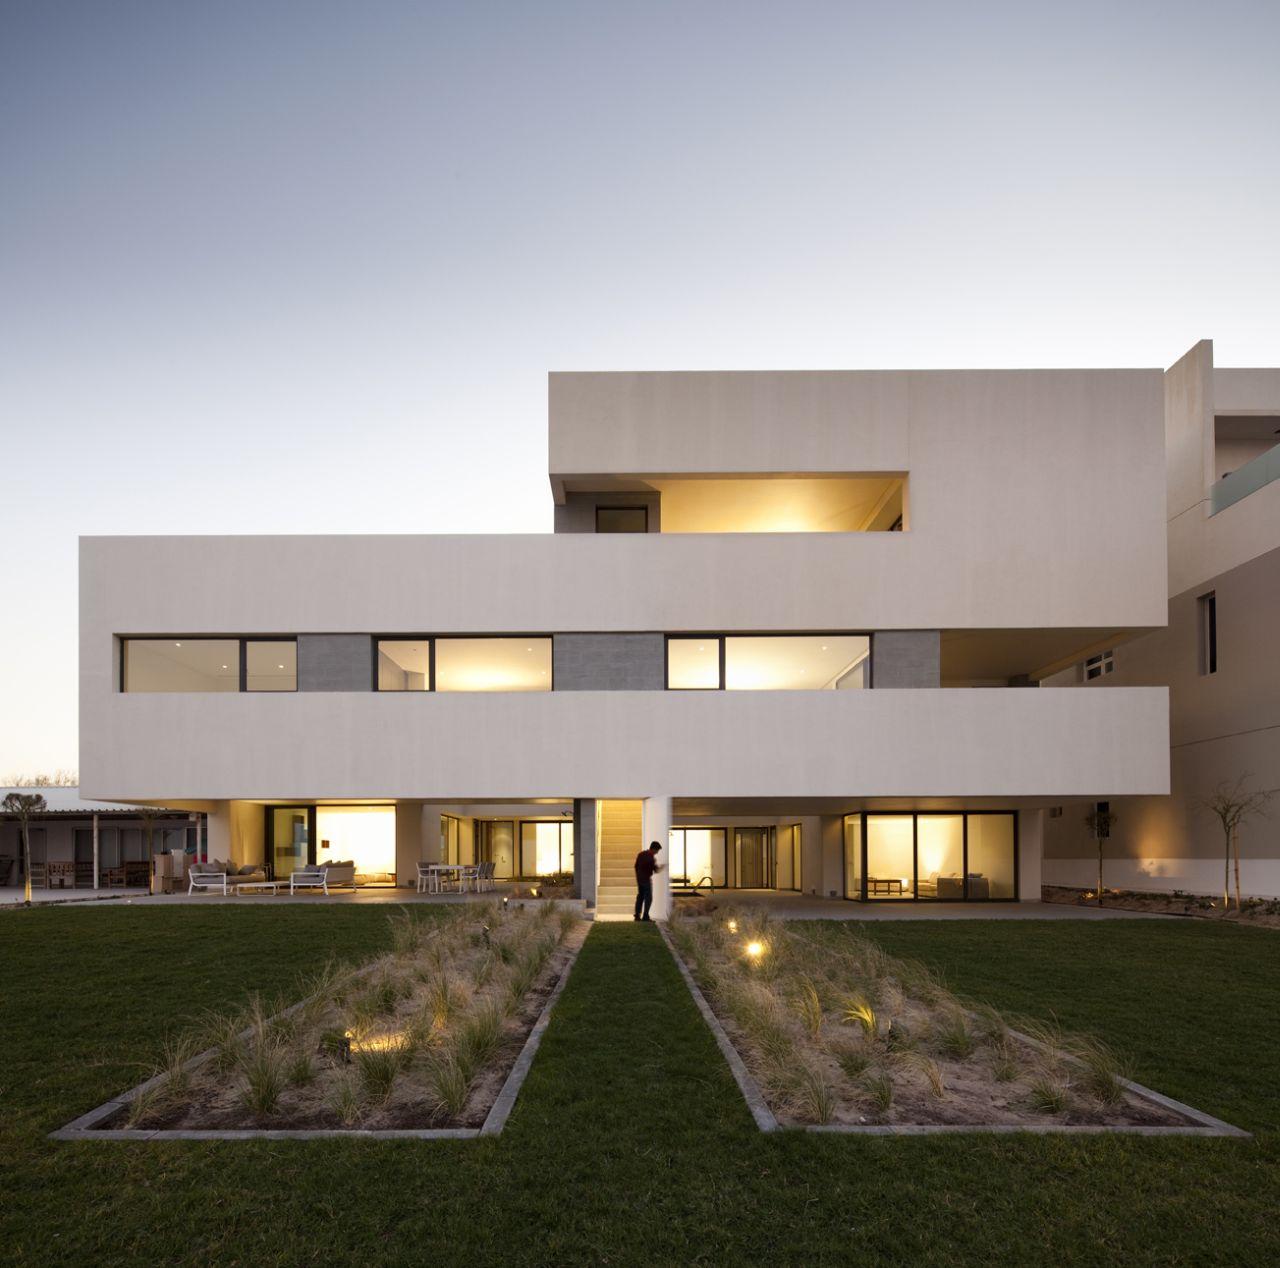 Chalé S Cube / AGi architects, © Nelson Garrido